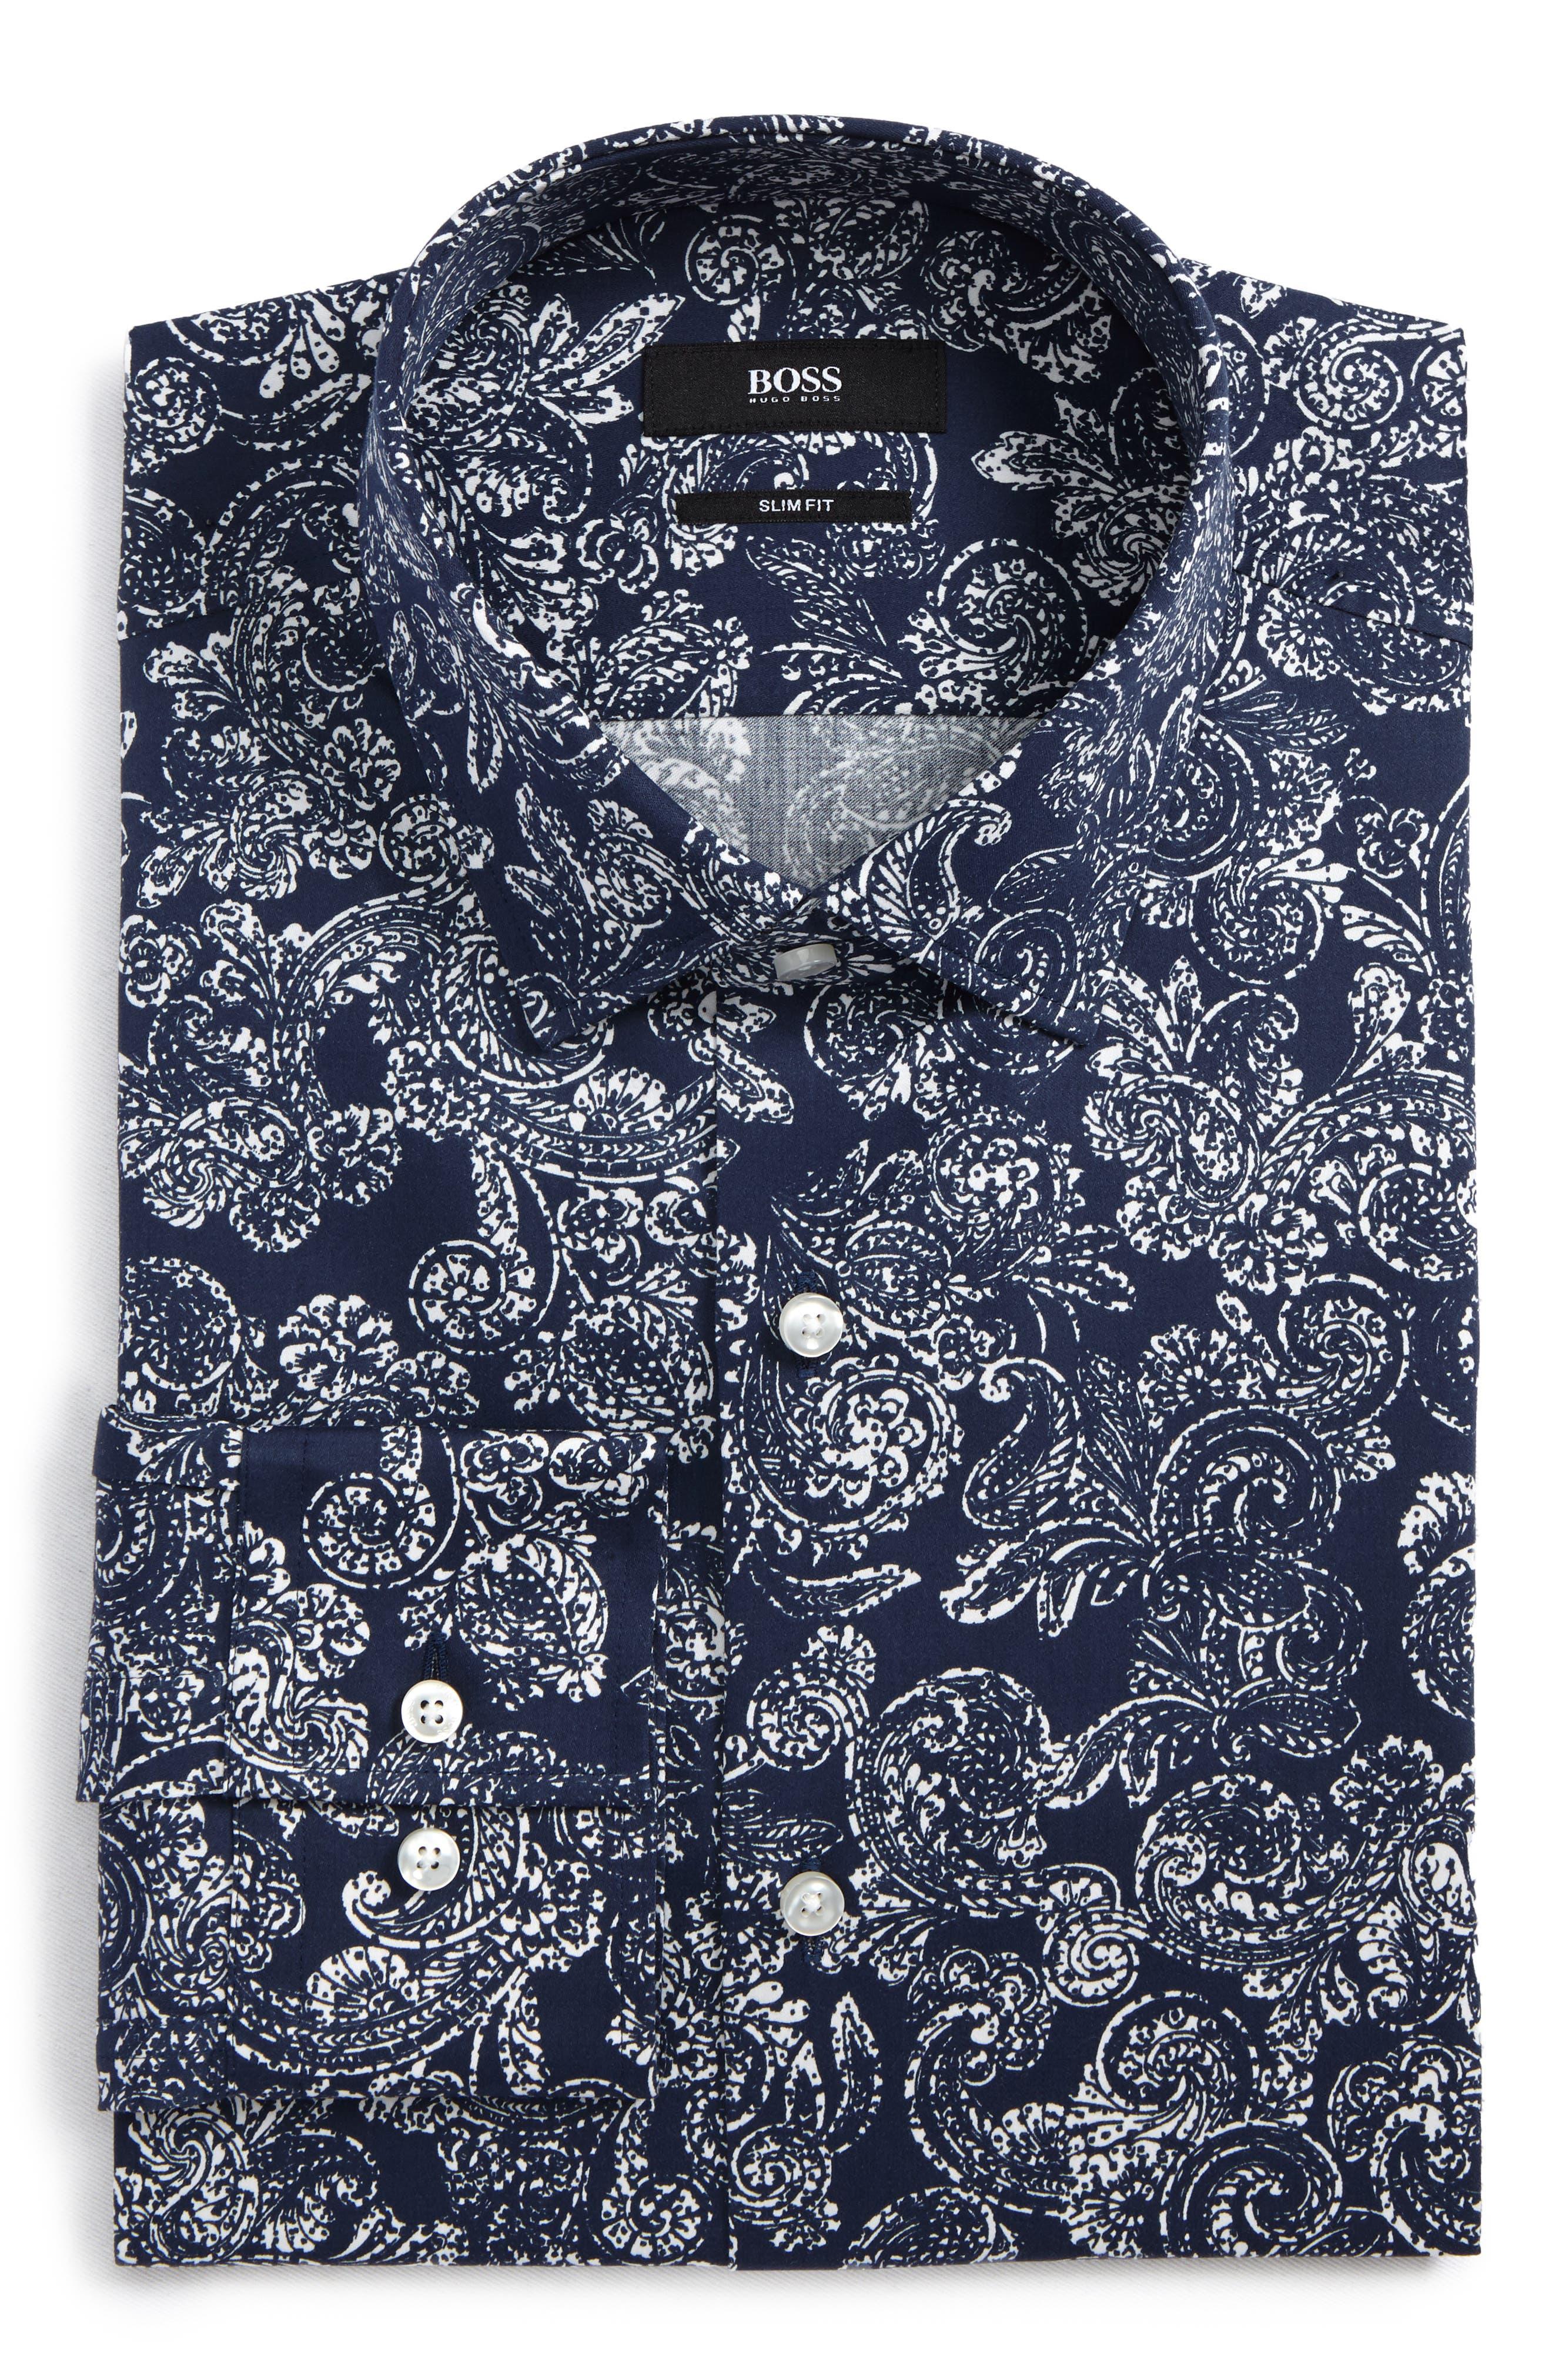 Alternate Image 1 Selected - BOSS Slim Fit Paisley Dress Shirt